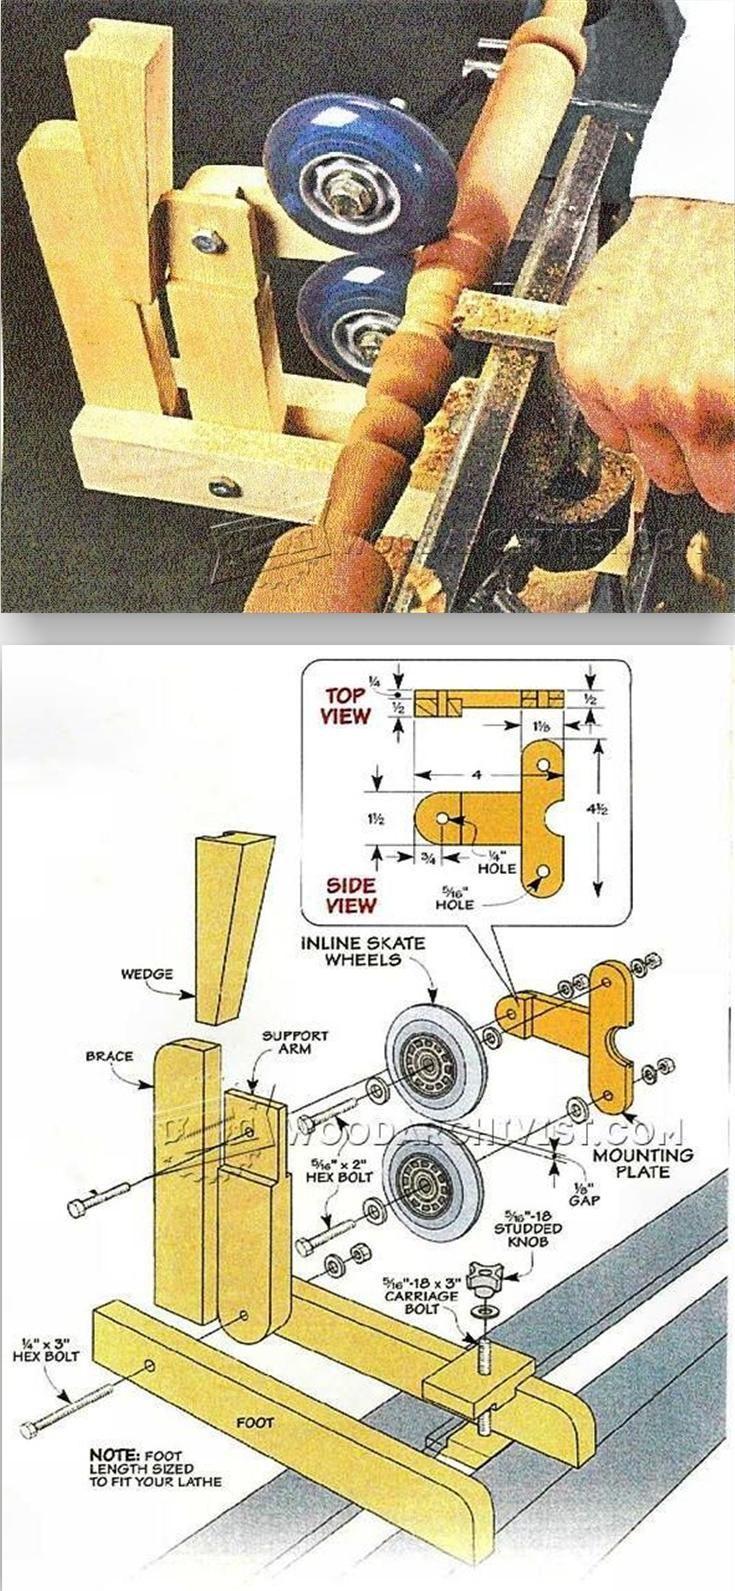 Wood Lathe Steady Rest Plans - Lathe Tips, Jigs and Fixtures   WoodArchivist.com